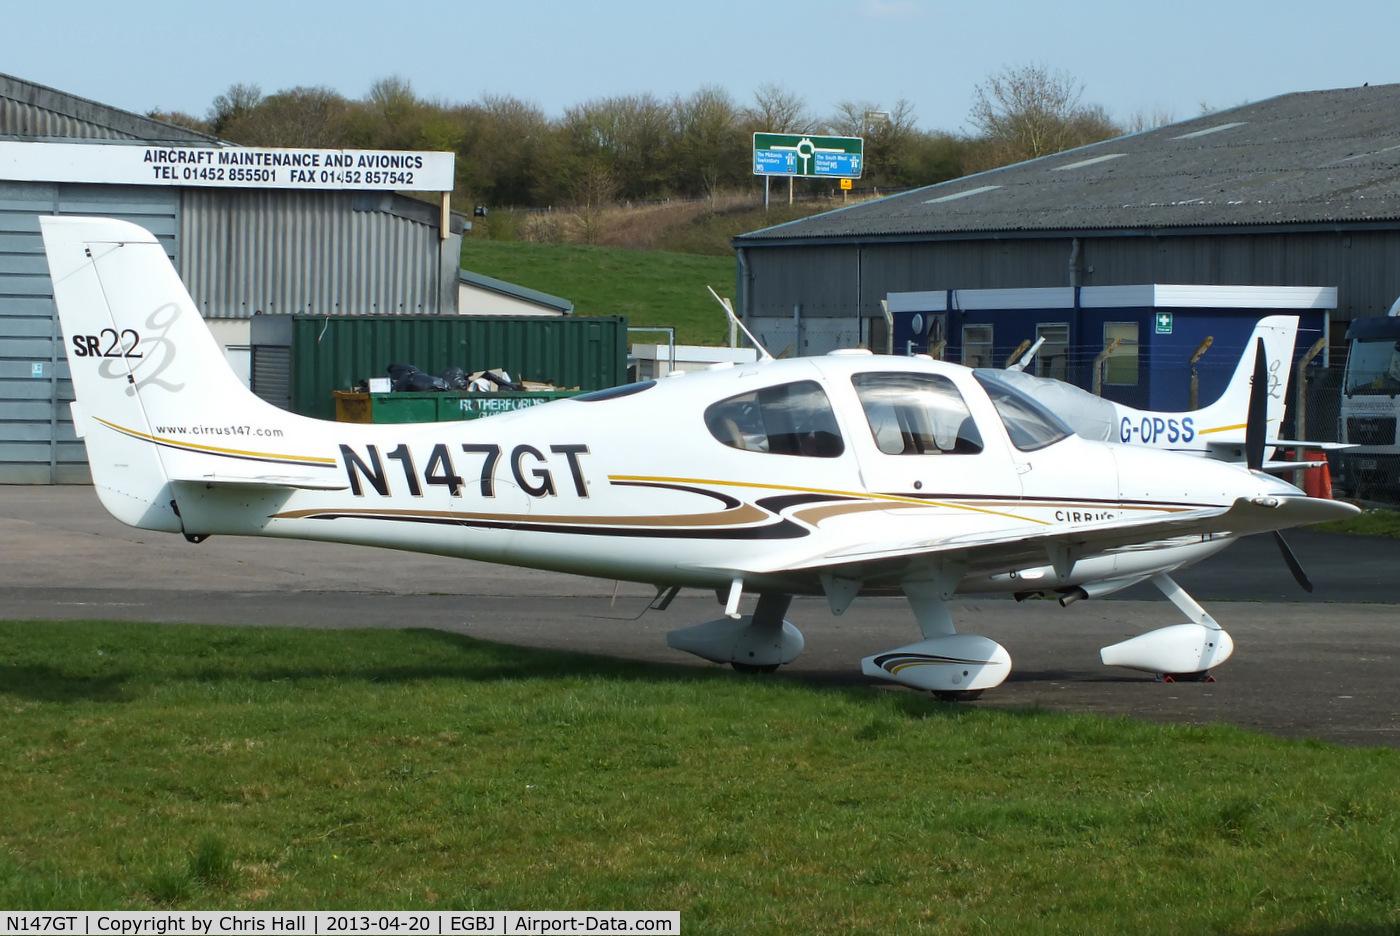 N147GT, 2004 Cirrus SR22 G2 C/N 1069, Cirrus147 flying group